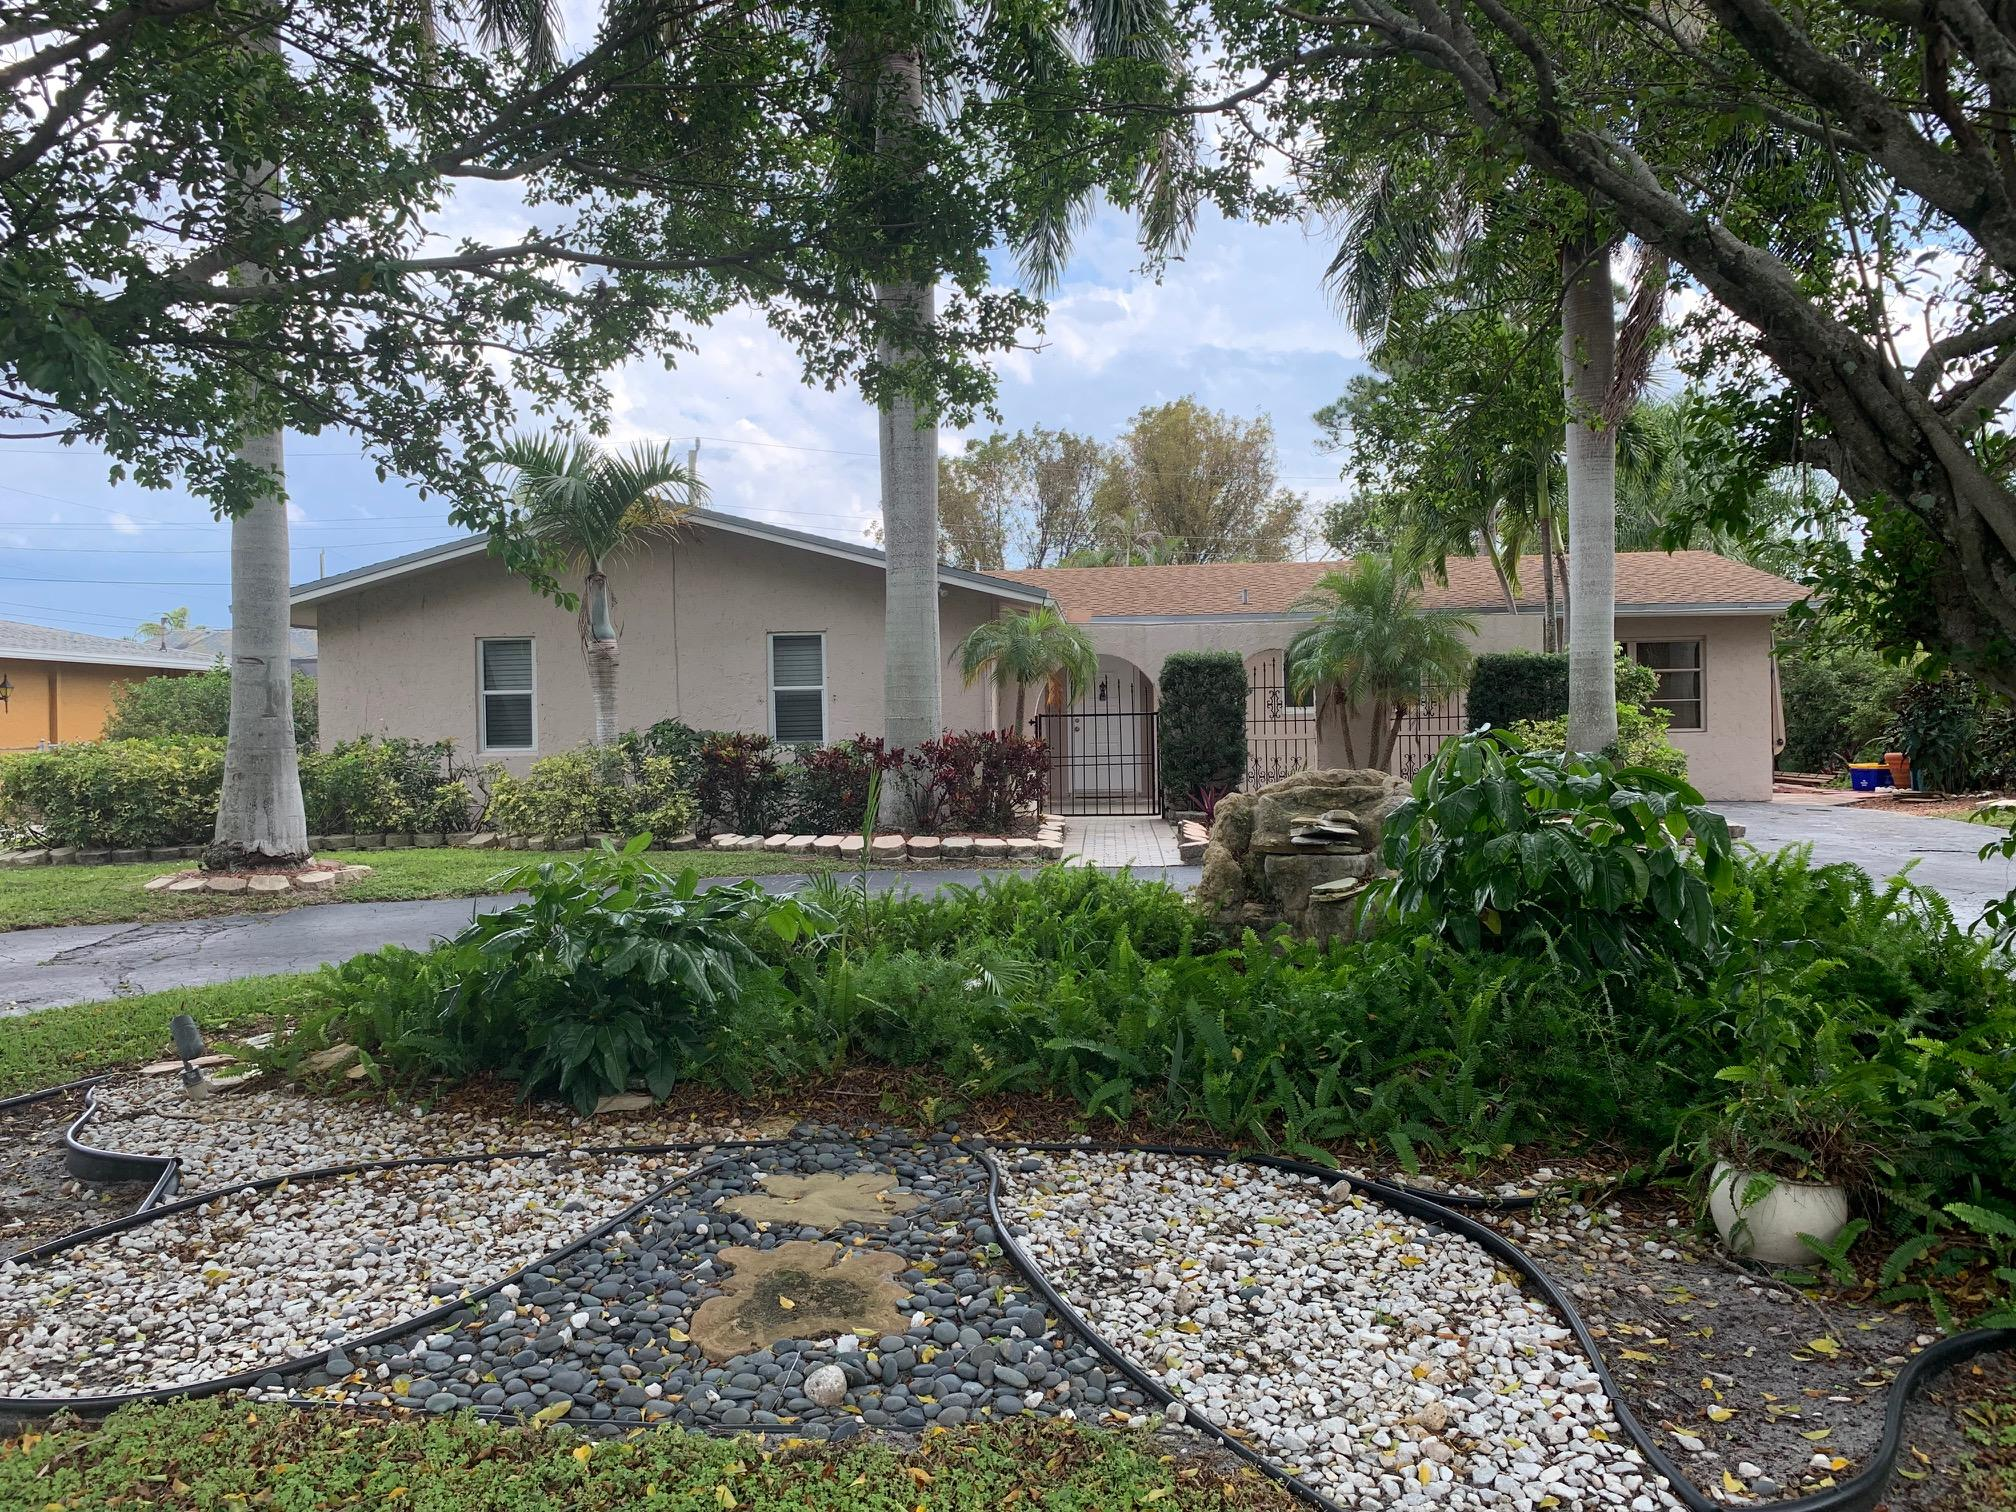 706 SW 23rd Terrace Boynton Beach, FL 33435